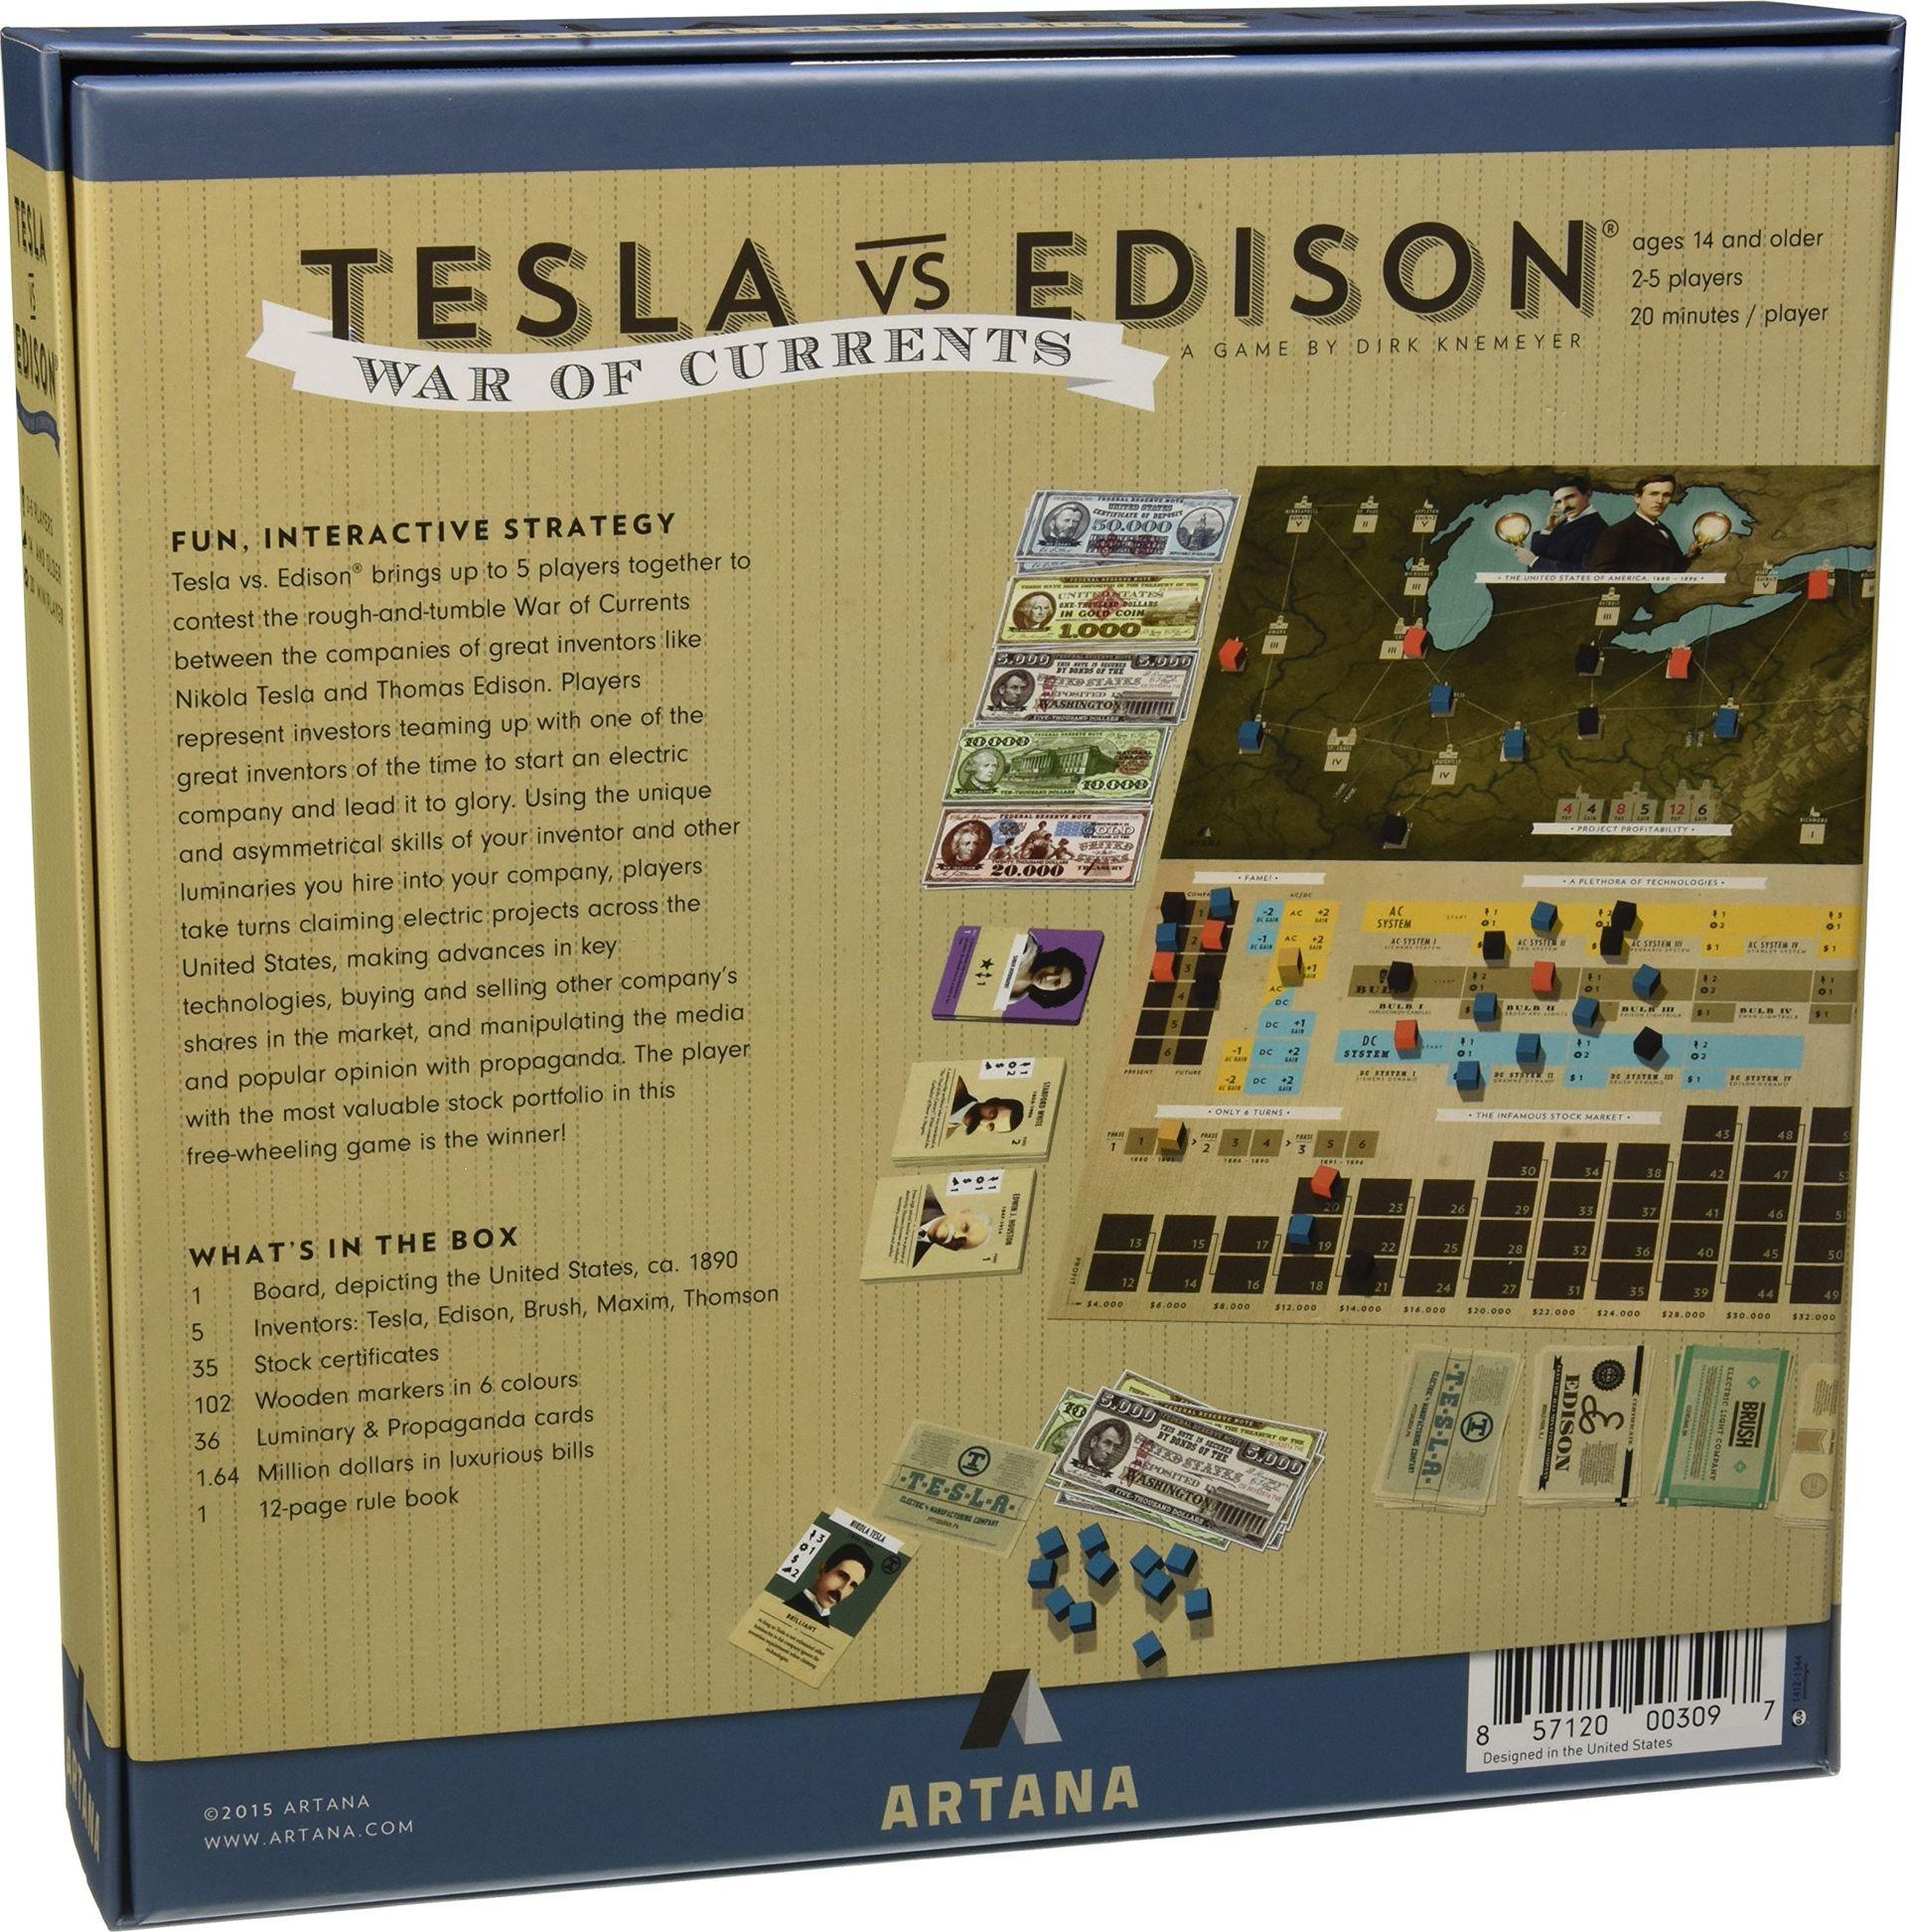 Tesla vs. Edison: War of Currents back of the box